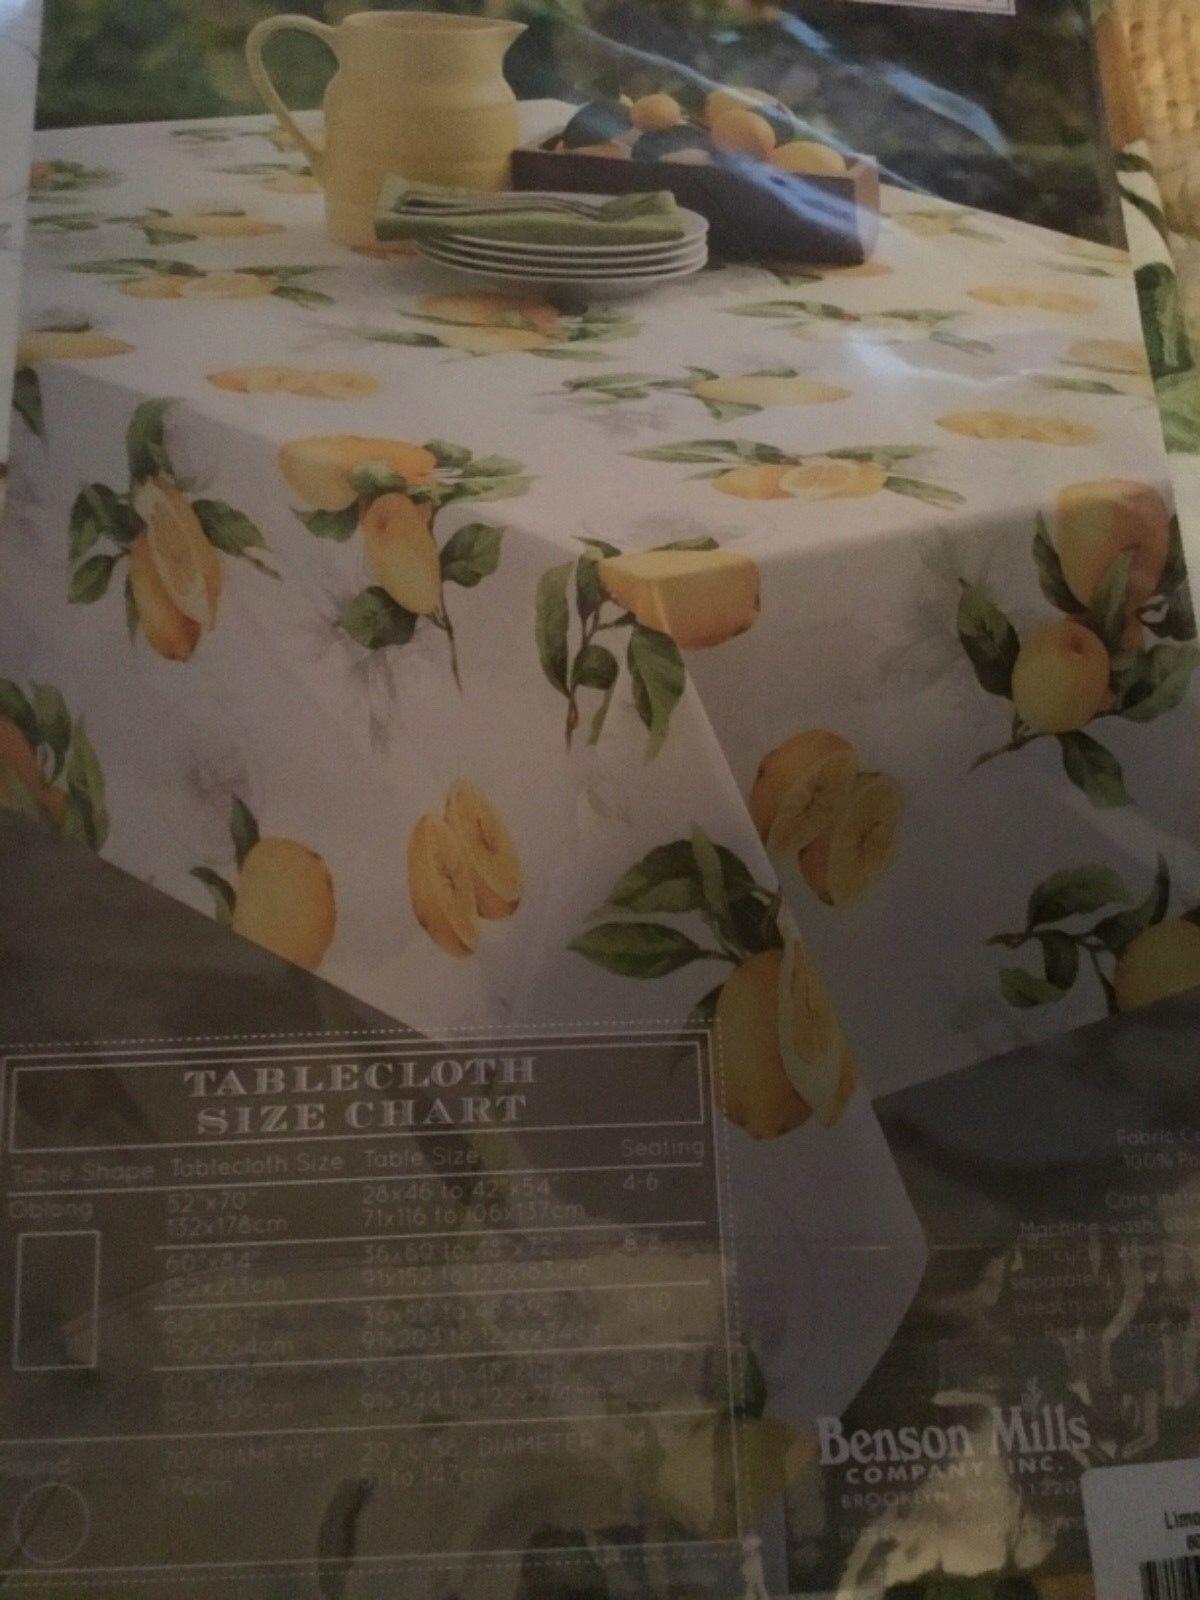 Lemon Tablescape, Limoncello, Spring, Tea Party, Table Cloth